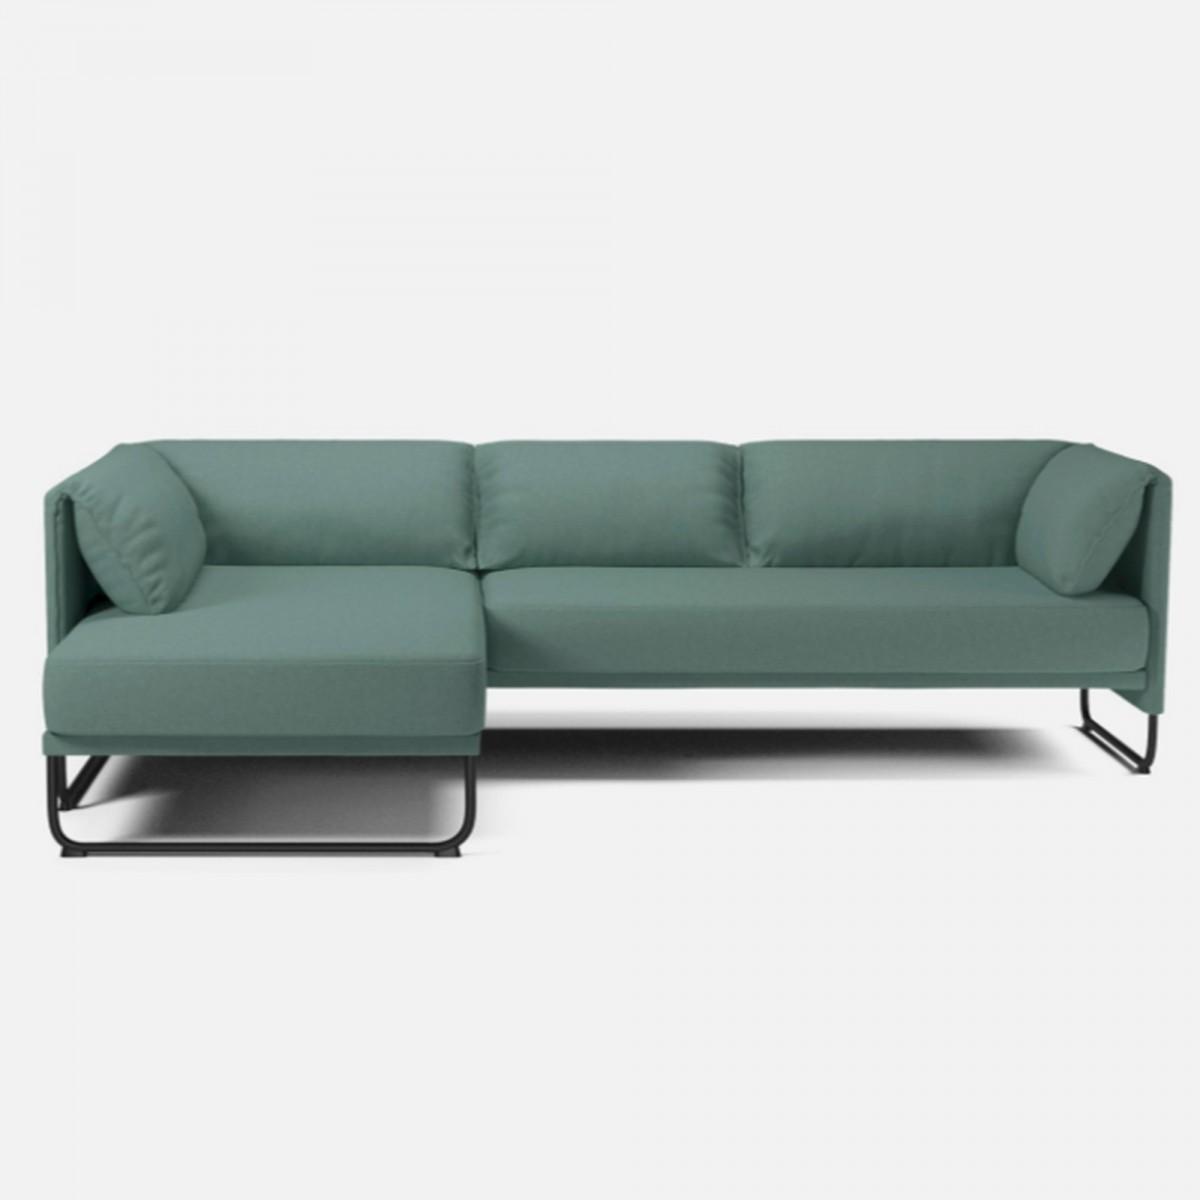 Mara sofa 3 seats with chaise longue bolia for 2 chaise longues three seat sofa